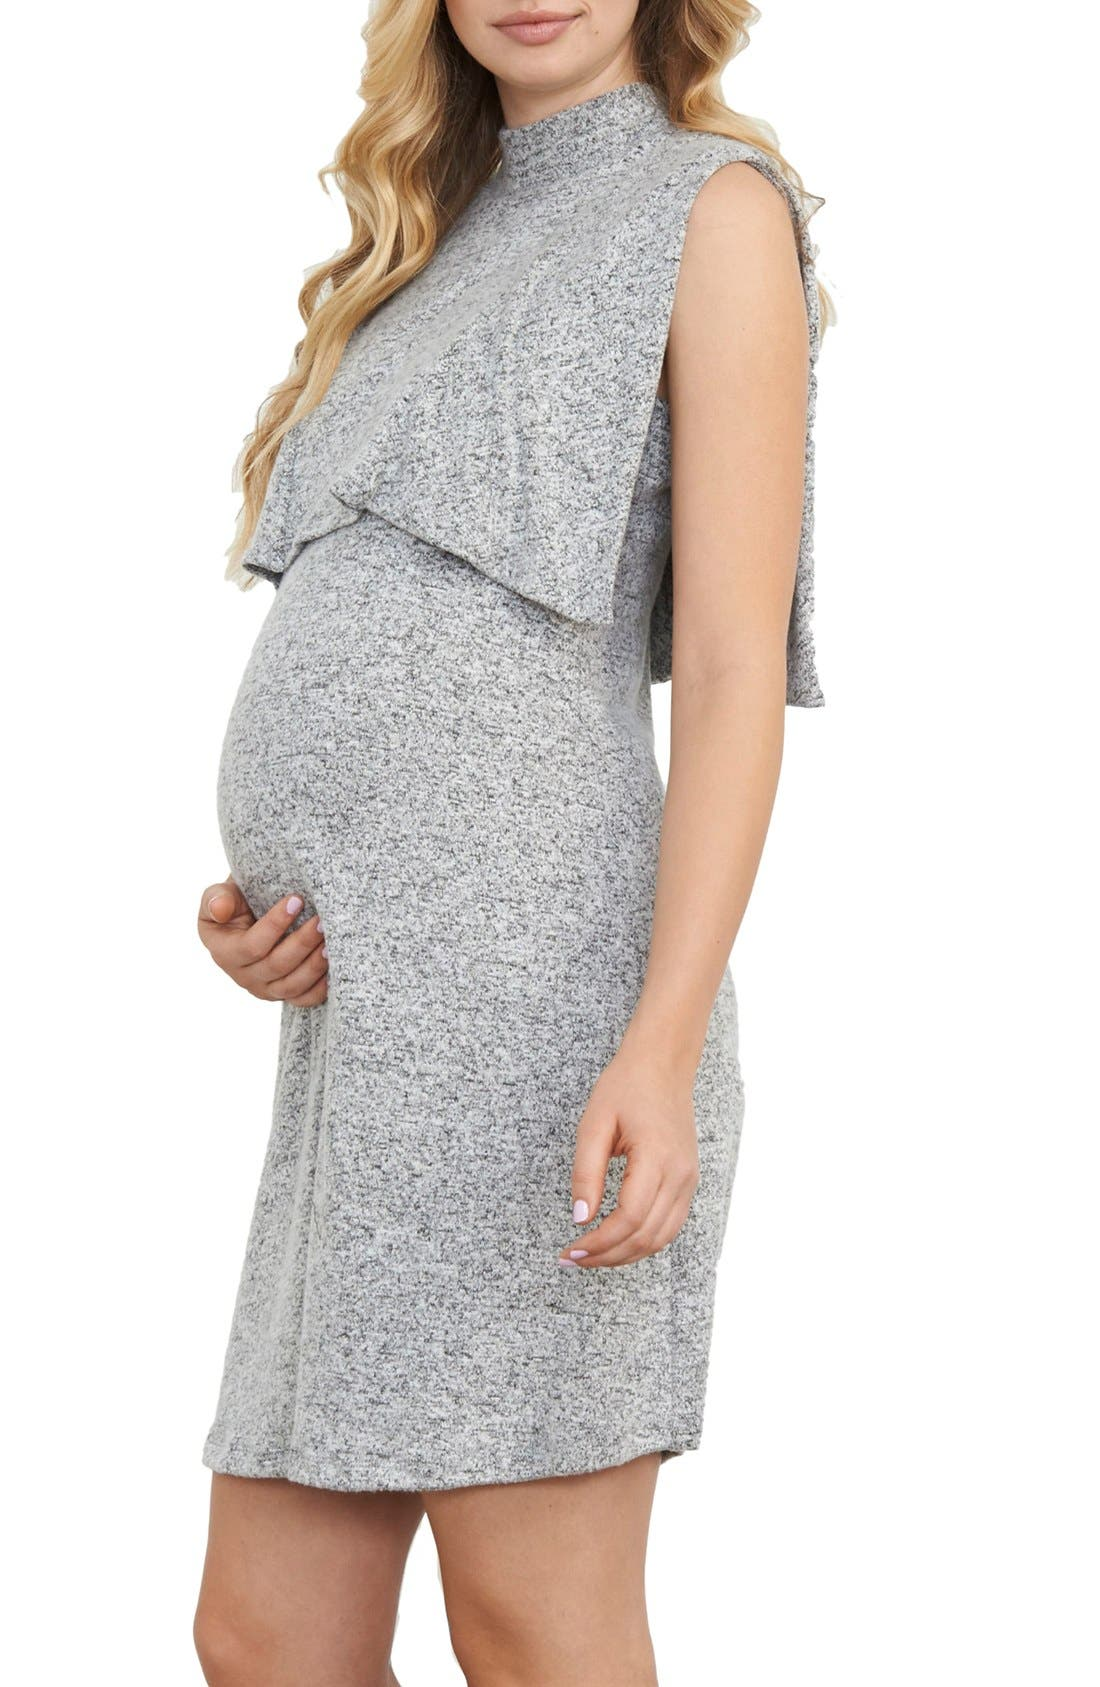 MATERNAL AMERICA Sleeveless Maternity/Nursing Dress, Main, color, GREY